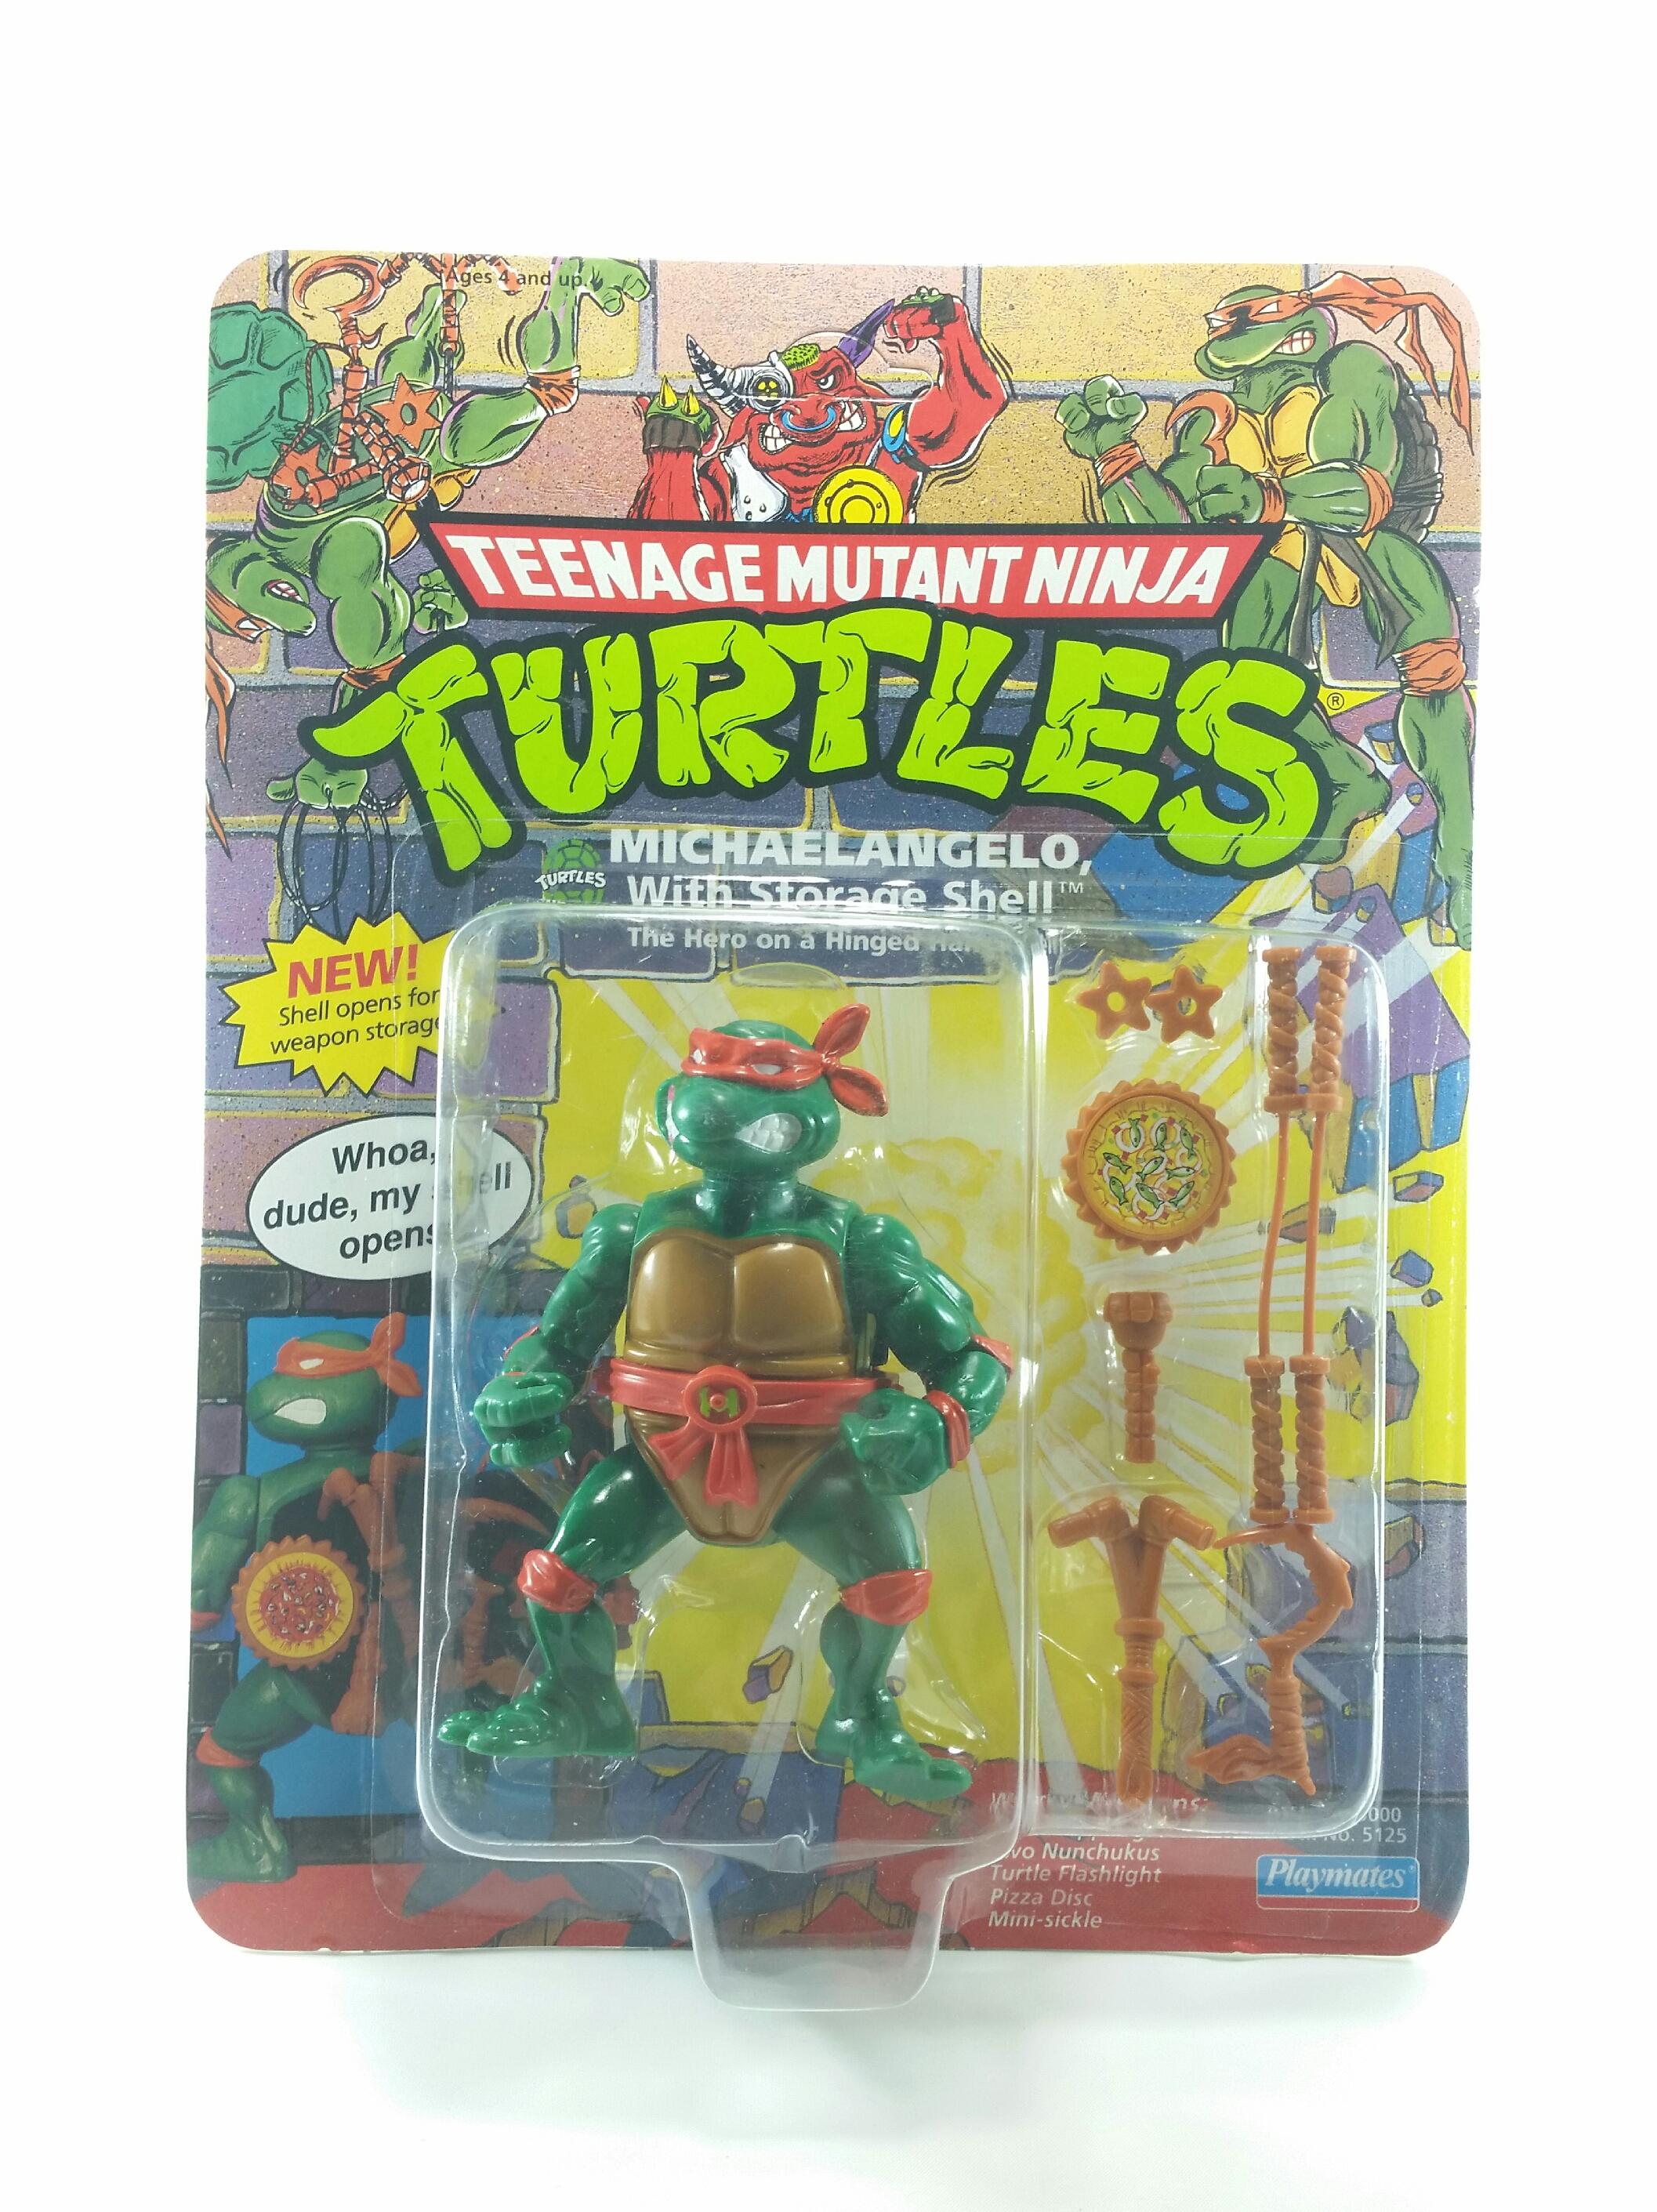 teenage-mutant-ninja-turtles-moc-michaelangelo-storage-shell-action-figure-original-vintage-carded-unpunched-64-p.jpg